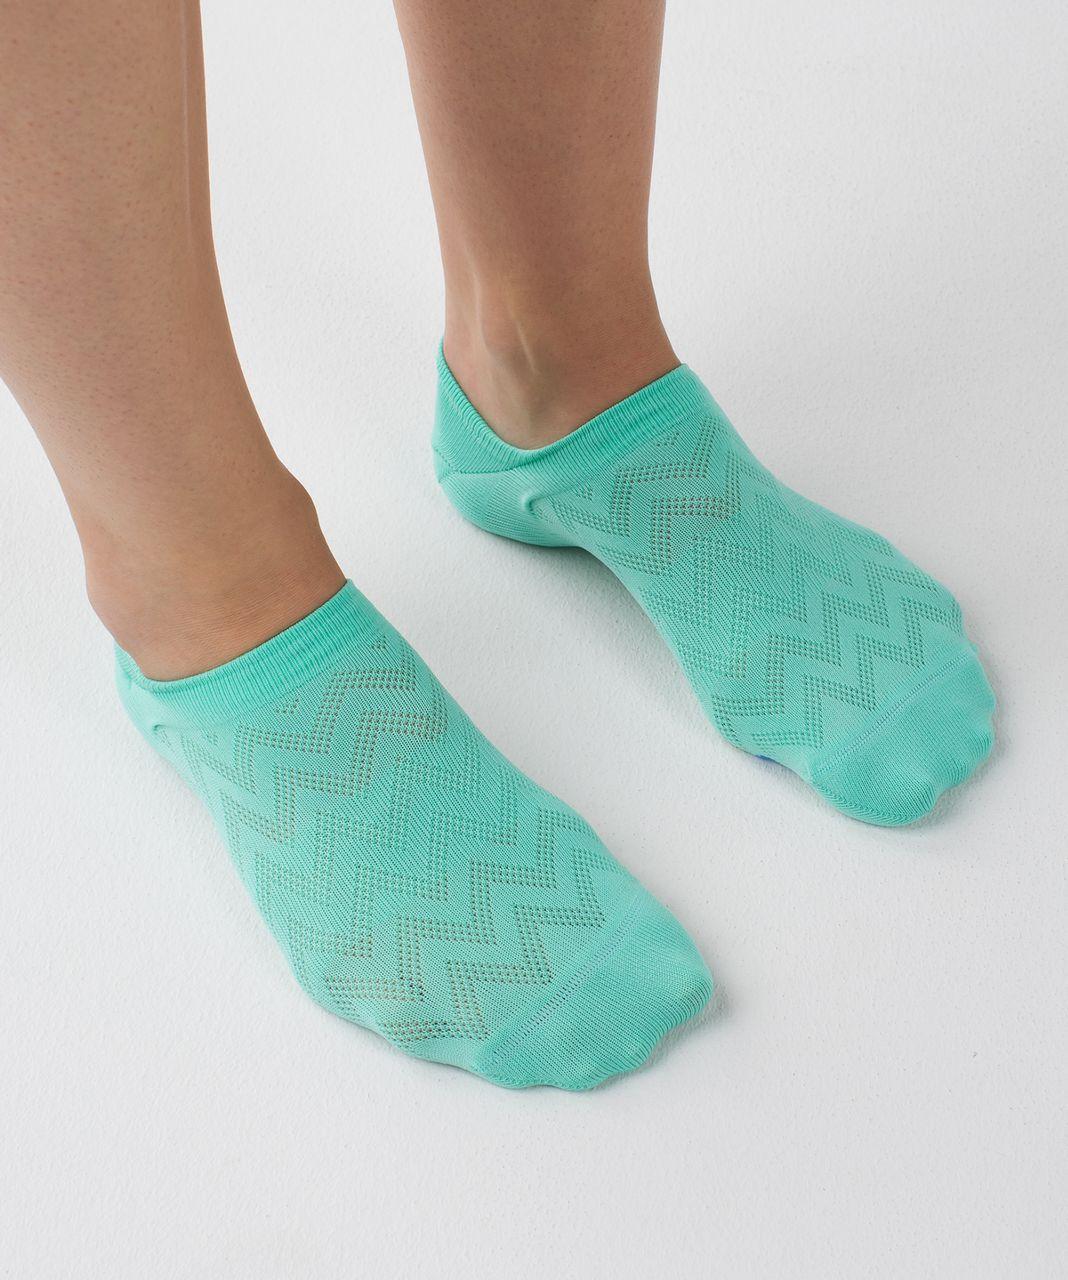 Lululemon Play All Day Sock - Menthol